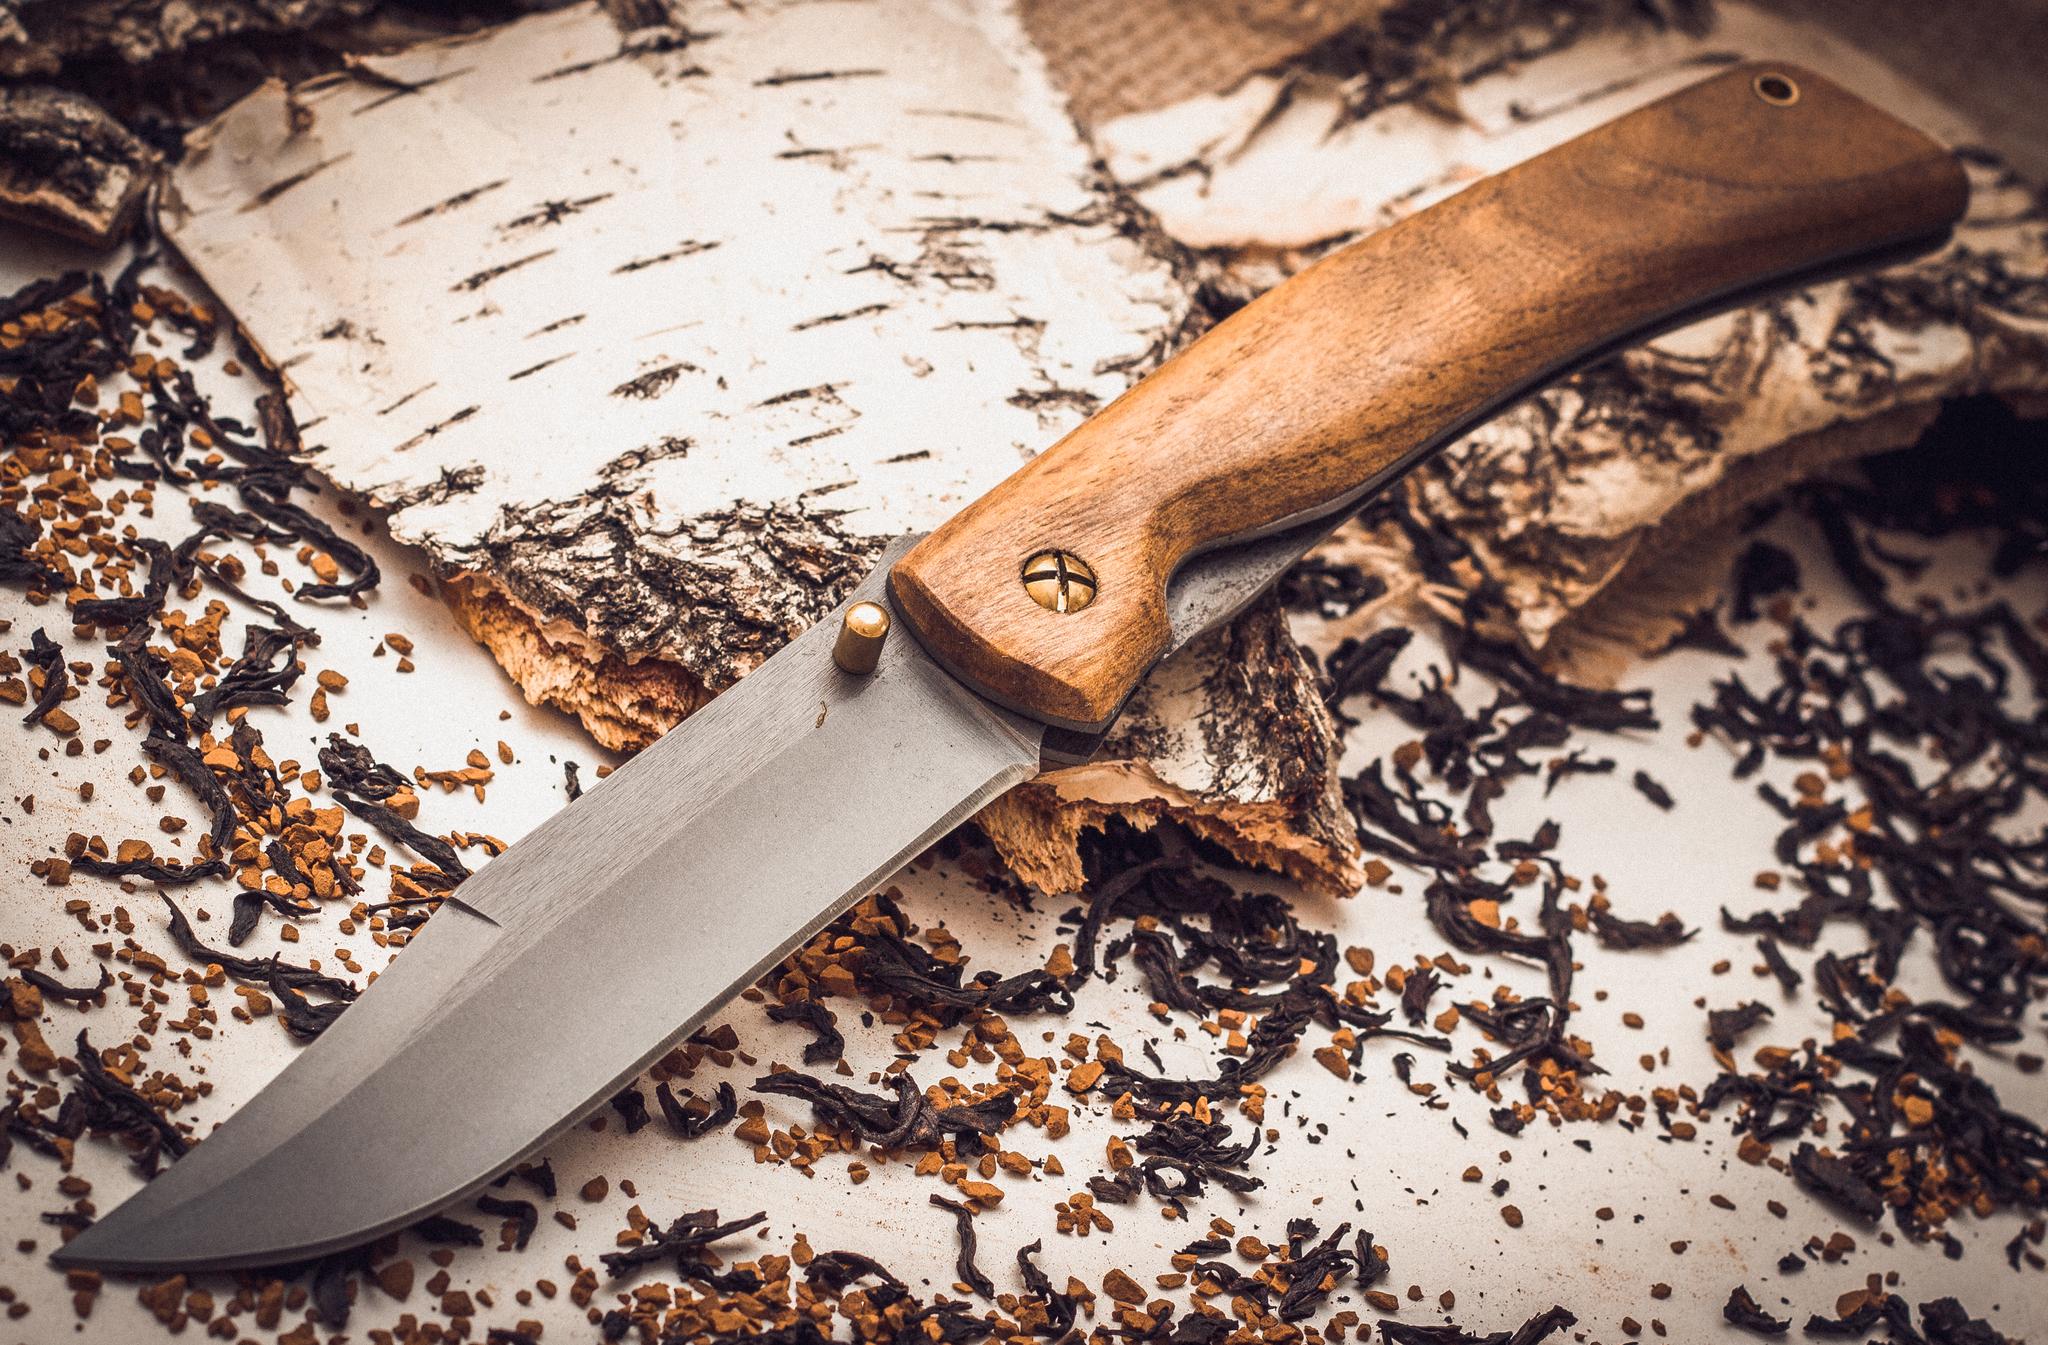 Фото 3 - Складной нож Храбрец, сталь 95х18, орех от Марычев